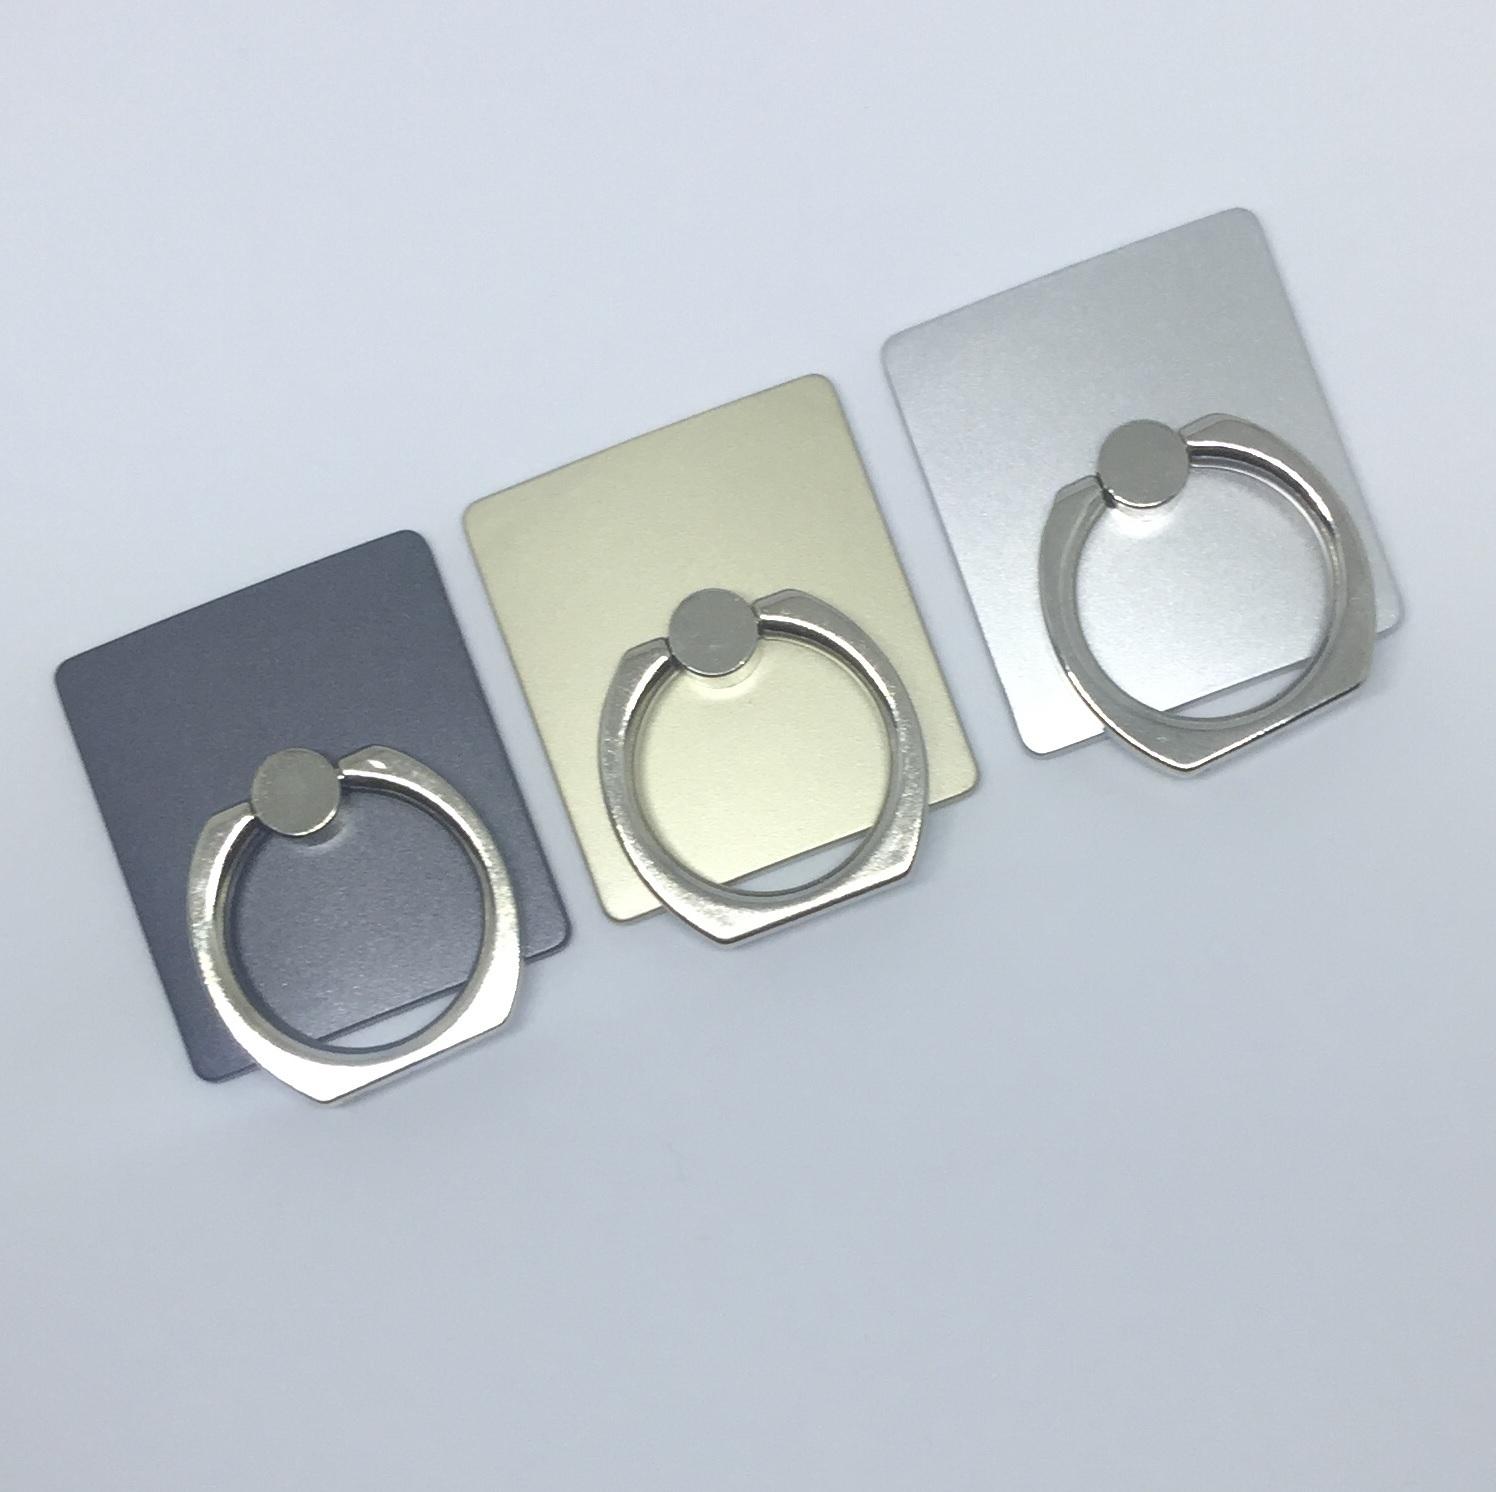 handy halterung fingerring griff halter 360 iphone. Black Bedroom Furniture Sets. Home Design Ideas